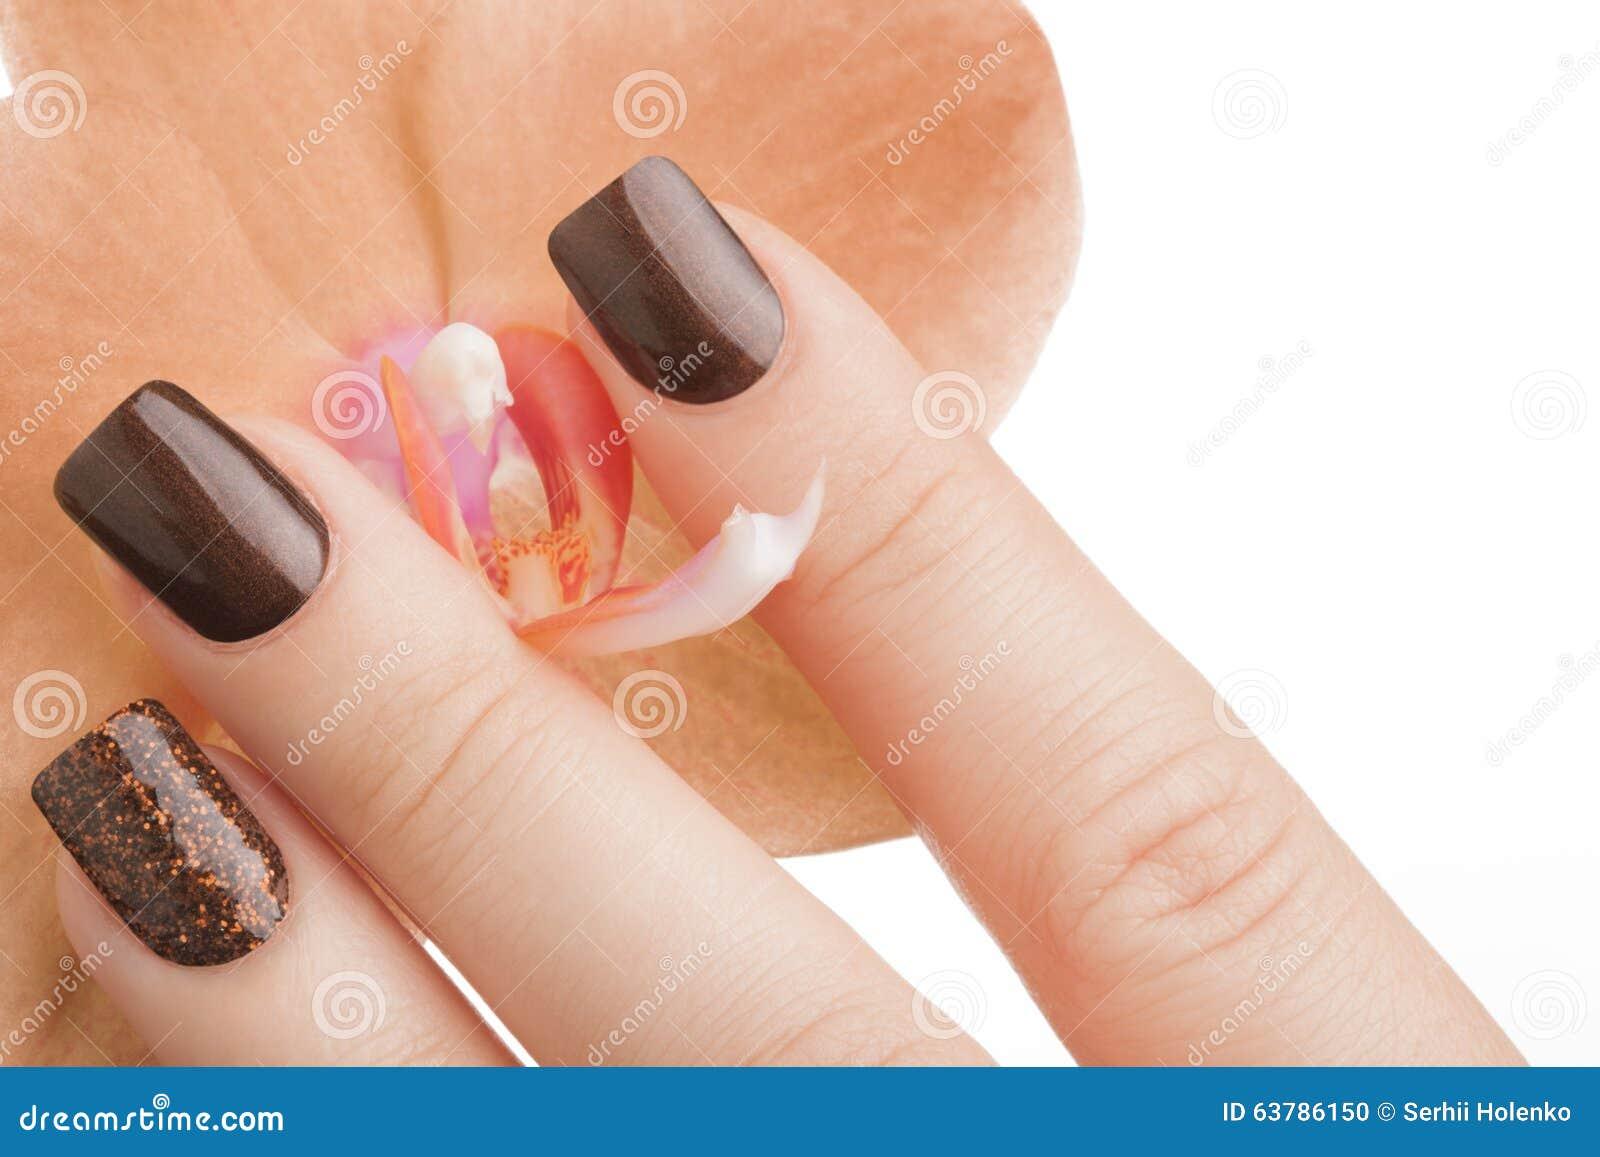 Brown nail polish on the nails stock photo image of beauty hand download brown nail polish on the nails stock photo image of beauty hand izmirmasajfo